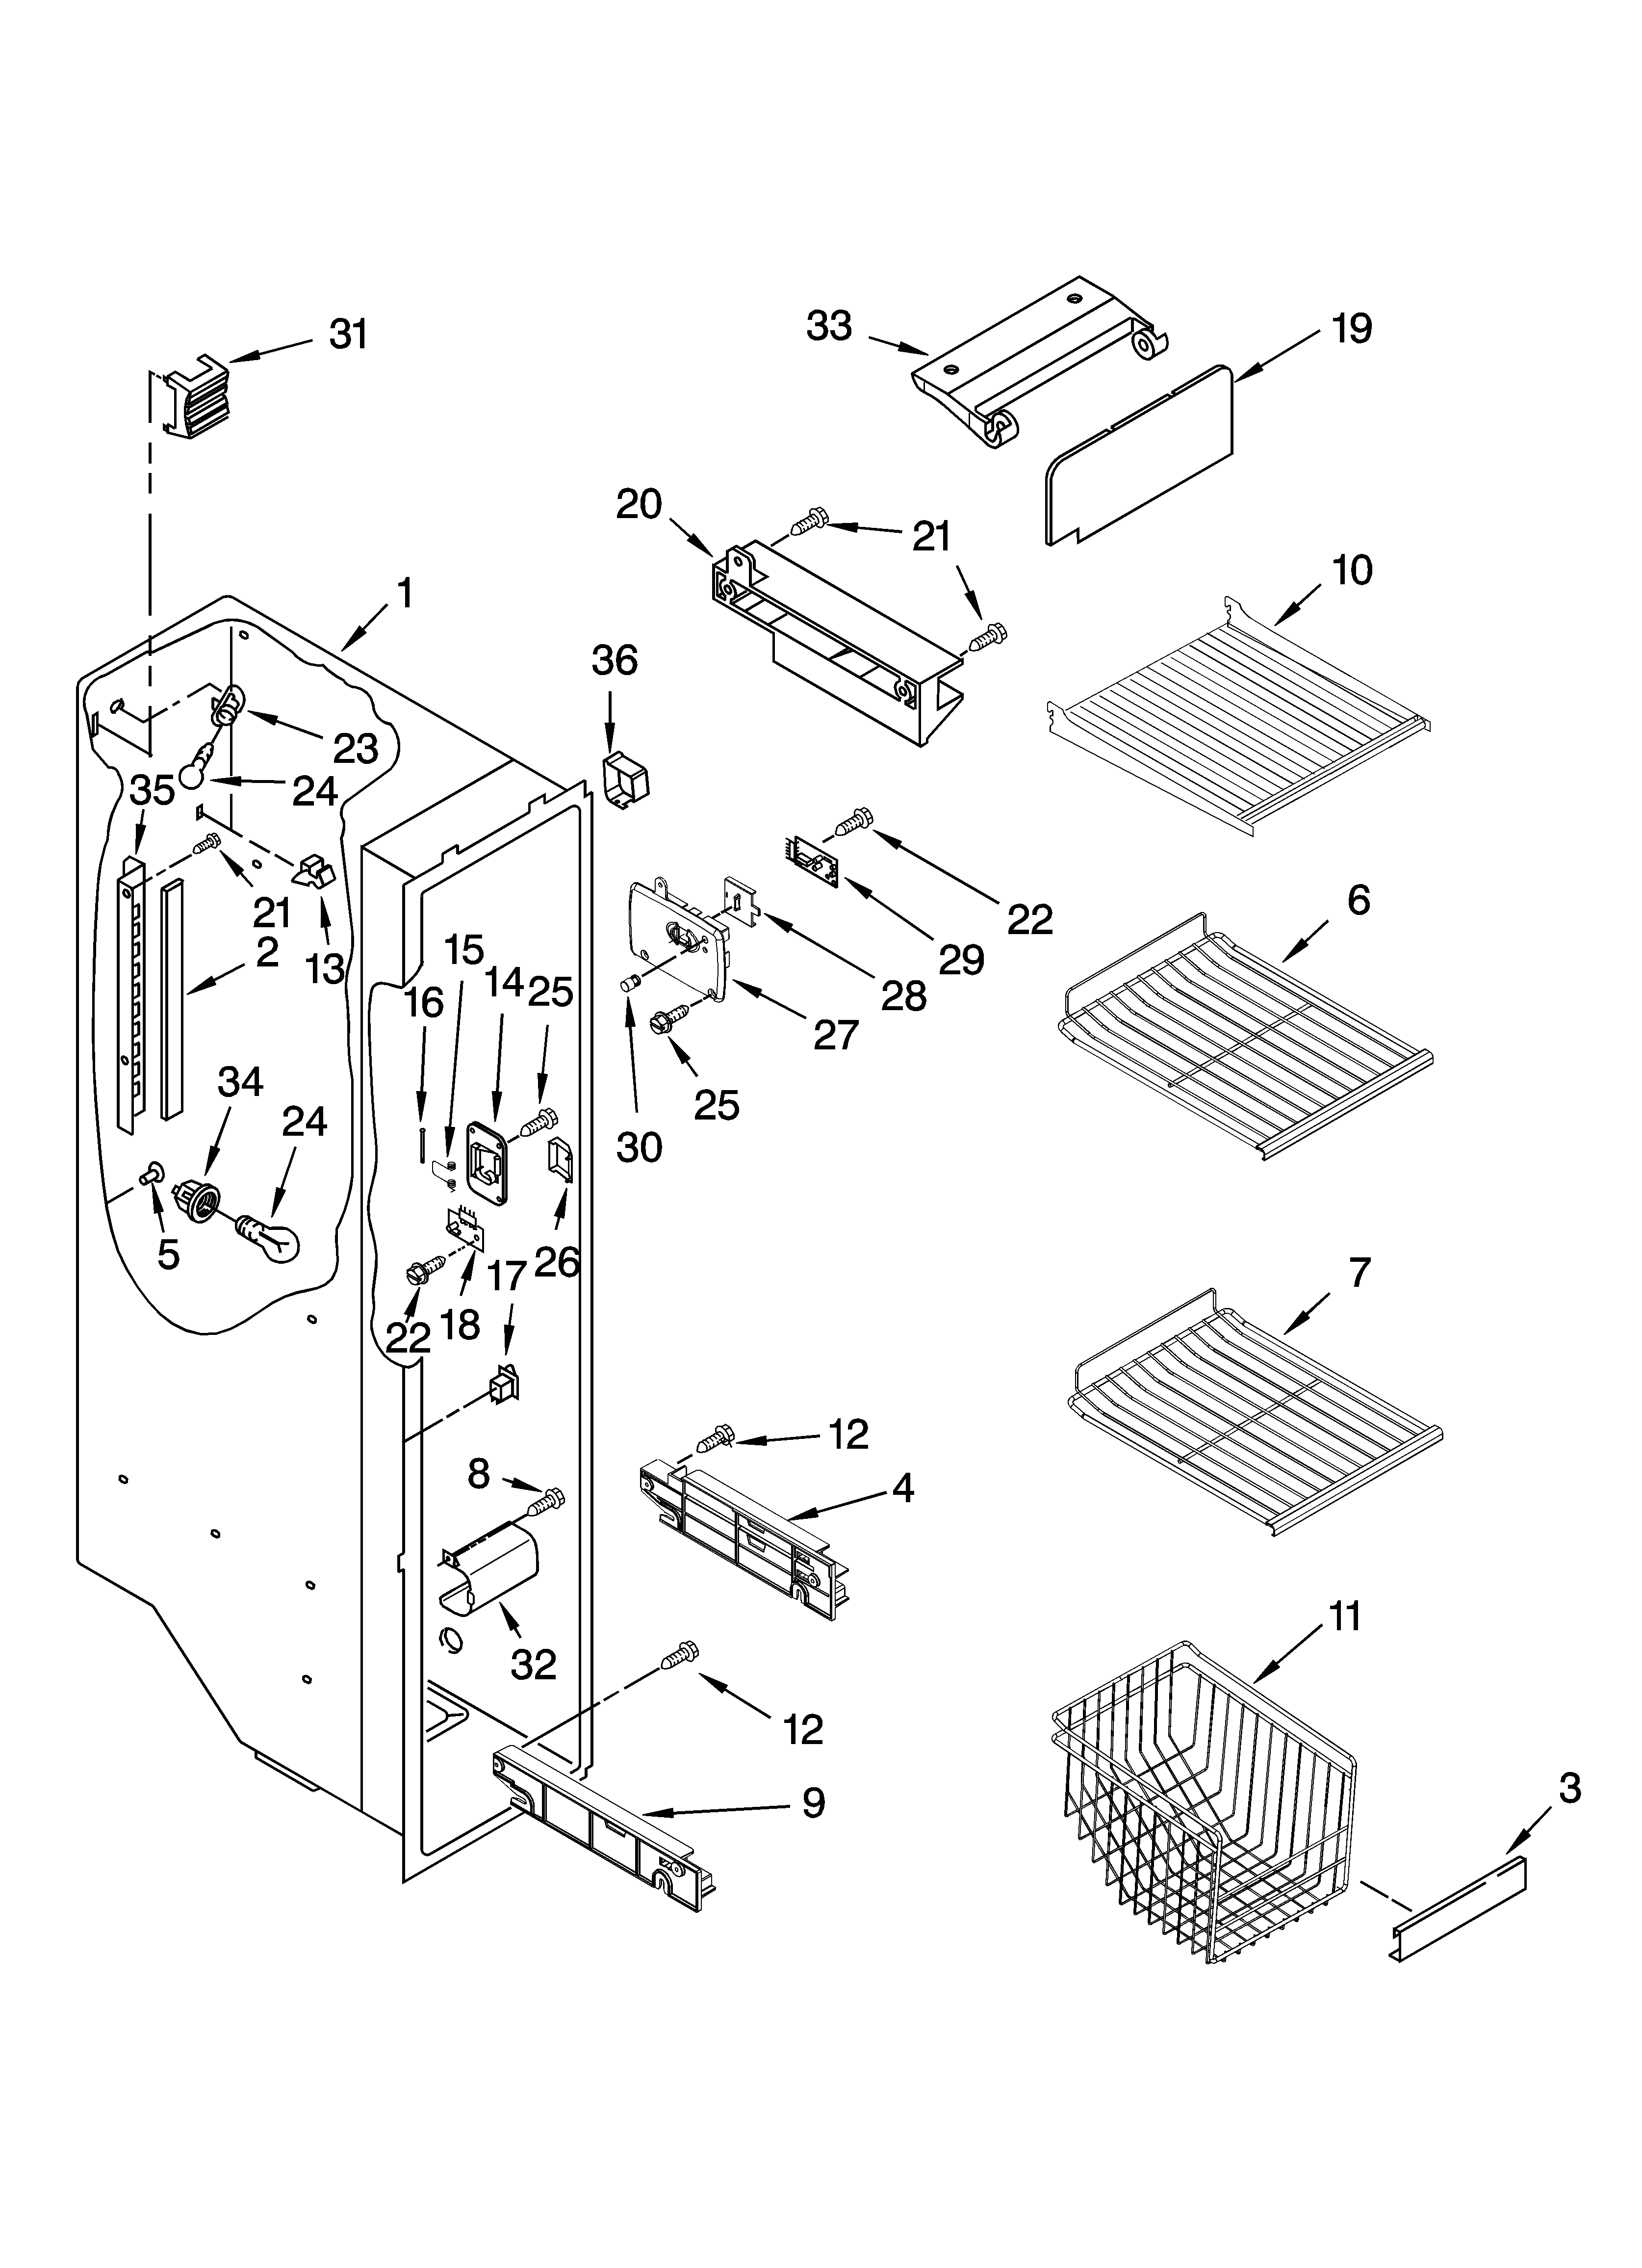 kenmore side by side refrigerator wiring diagram - kenmore ice maker parts  diagram new kenmore elite